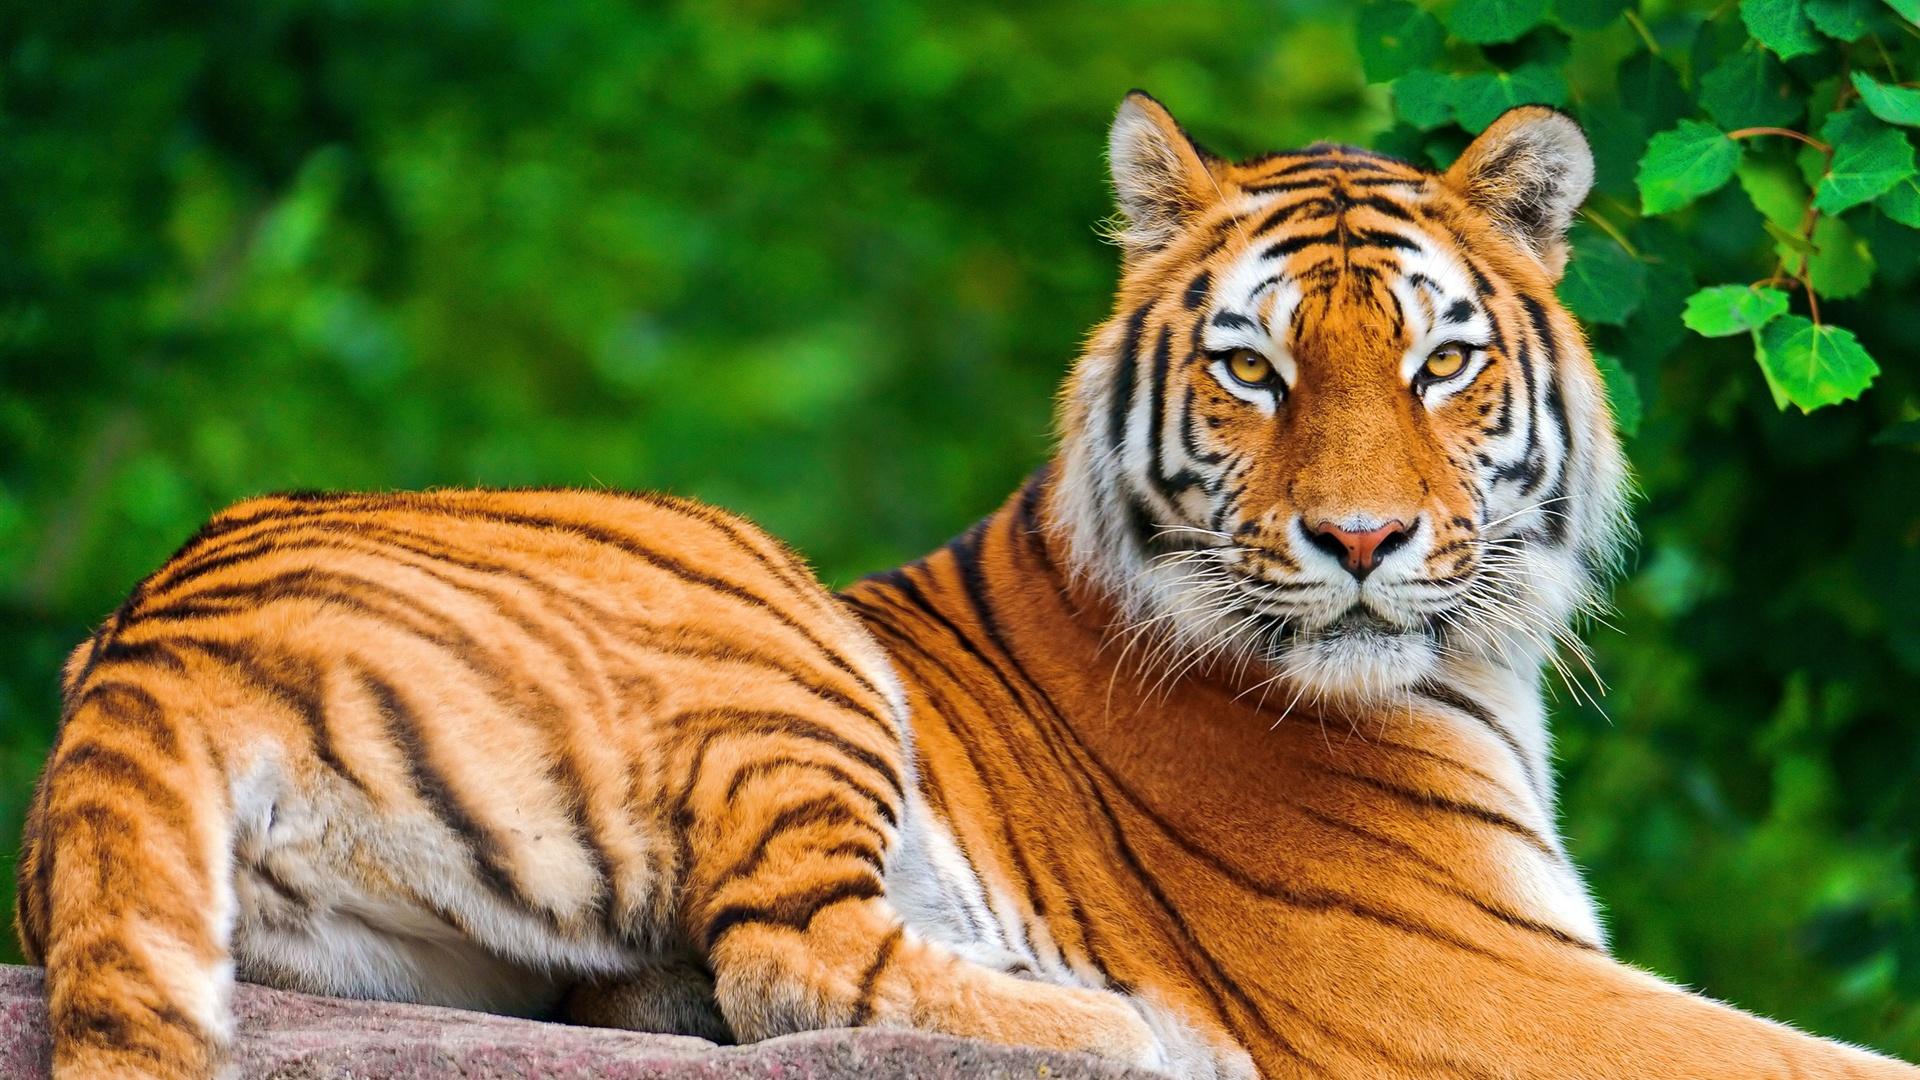 Cute Tiger Wallpaper   Desktop Backgrounds 1920x1080